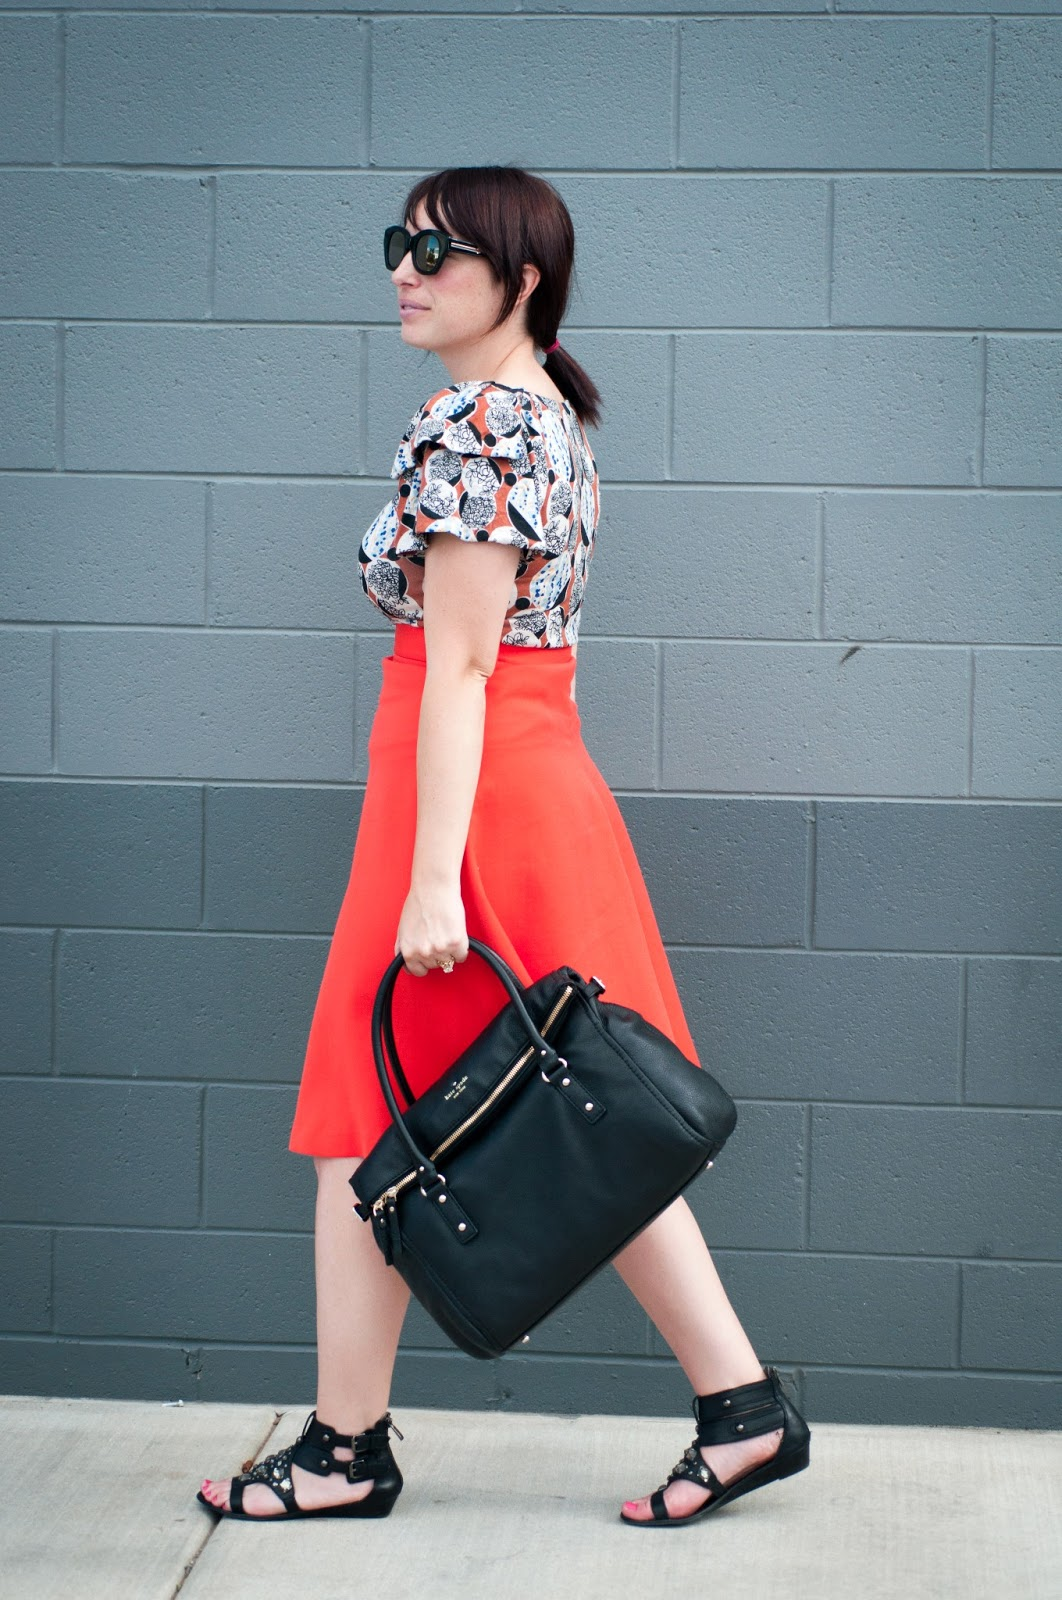 style blog, fashion blog, kate spade new york, sam edleman, karen walker, h and m, anthropologie, ootd